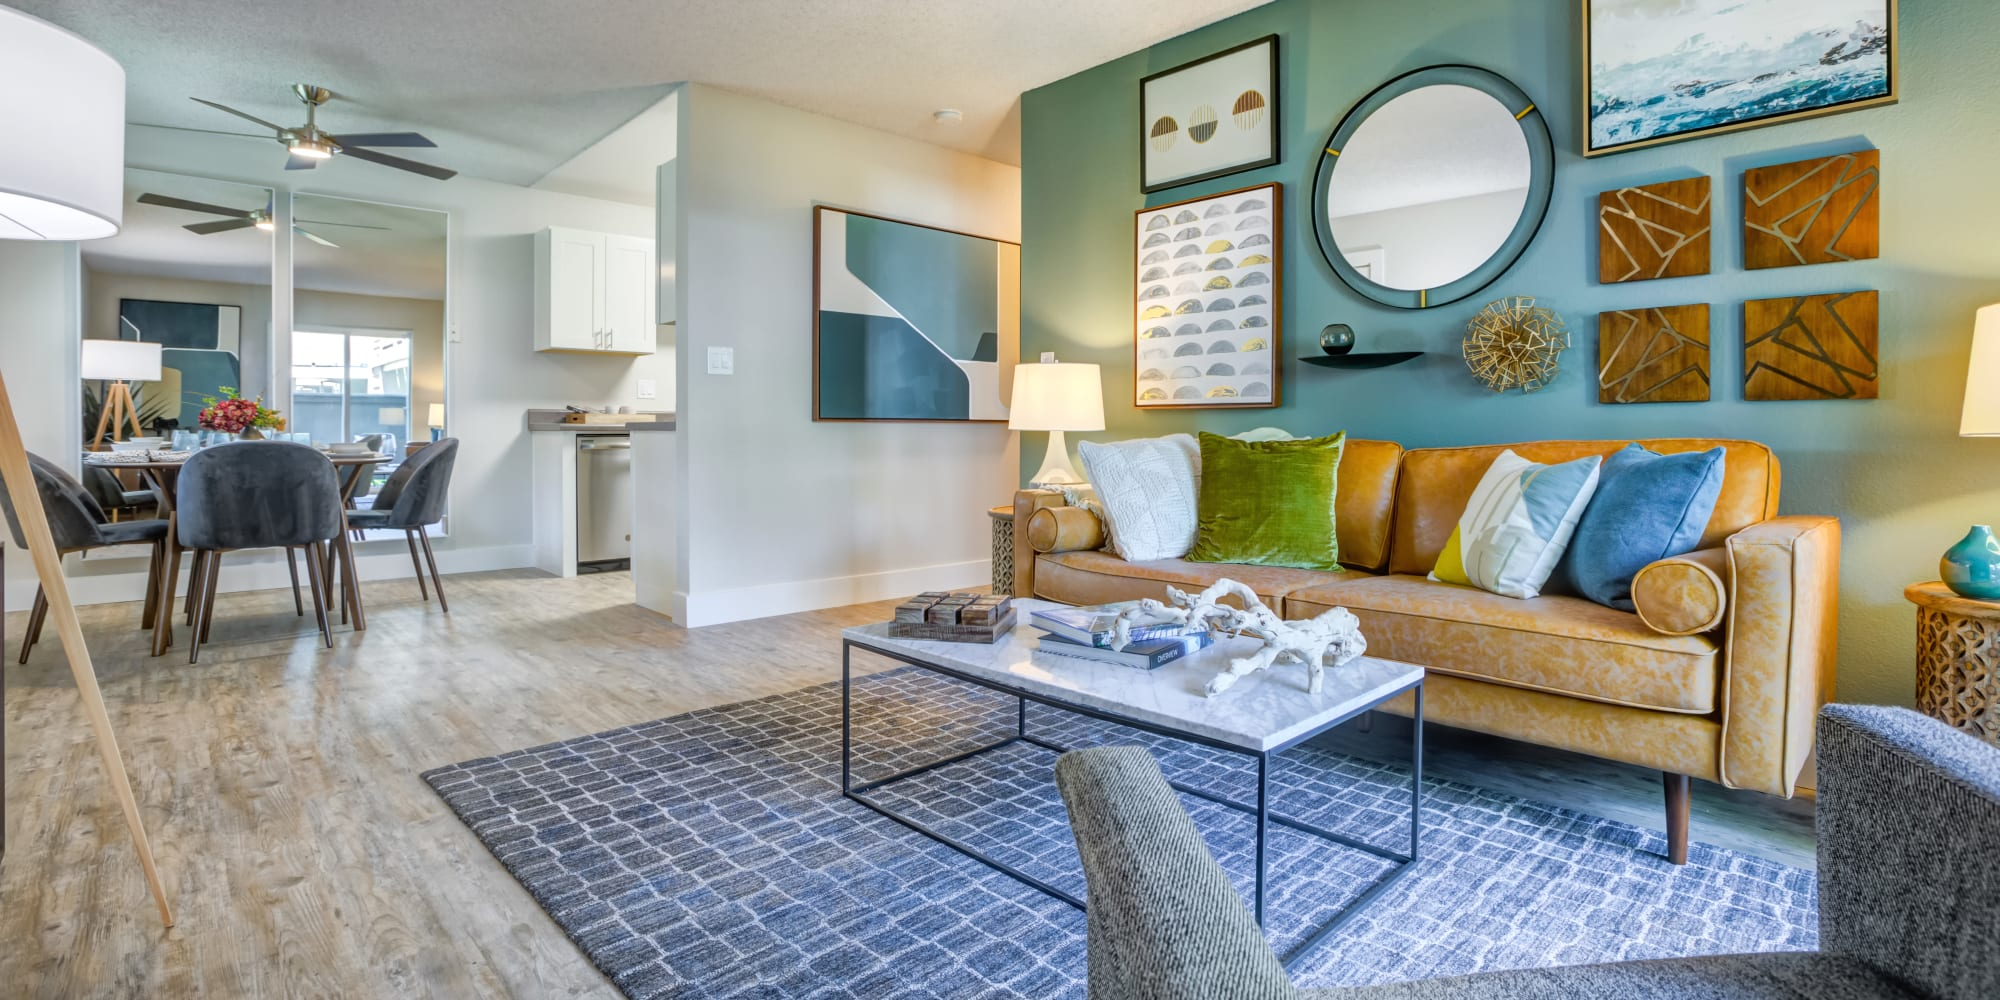 Union City, California, apartments at Sofi Union City